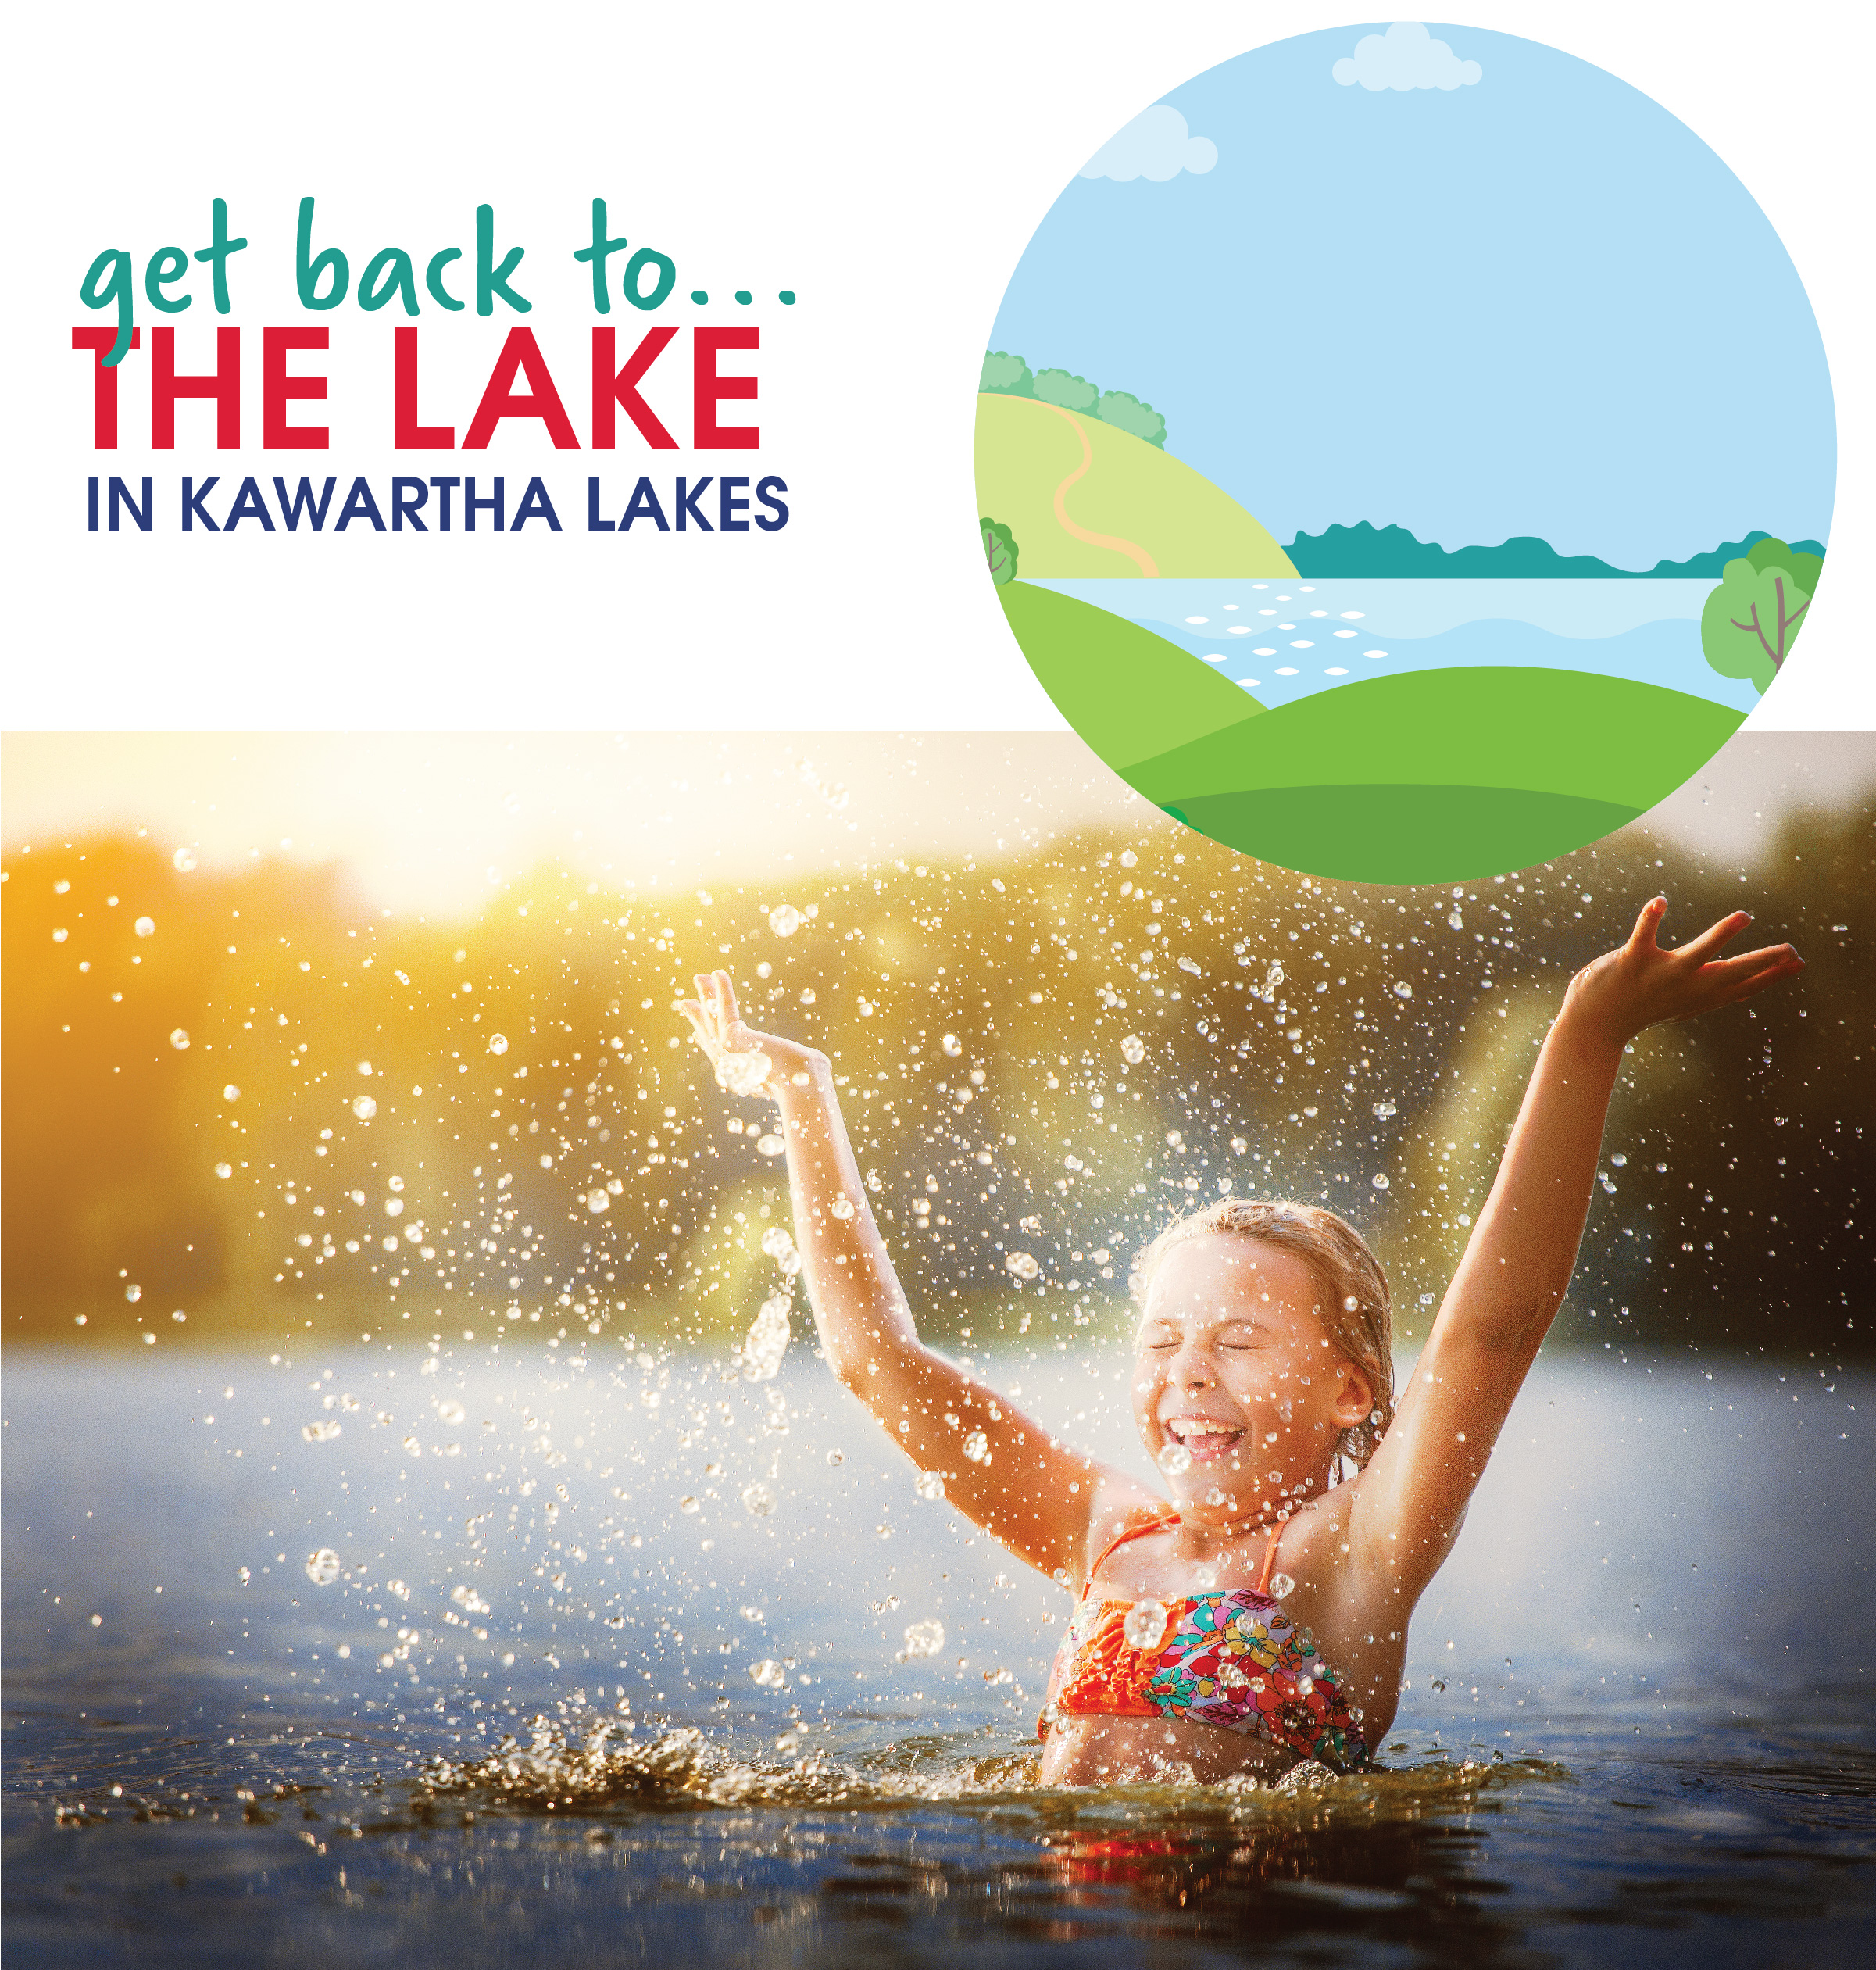 Get back to The Lake in Kawartha Lakes